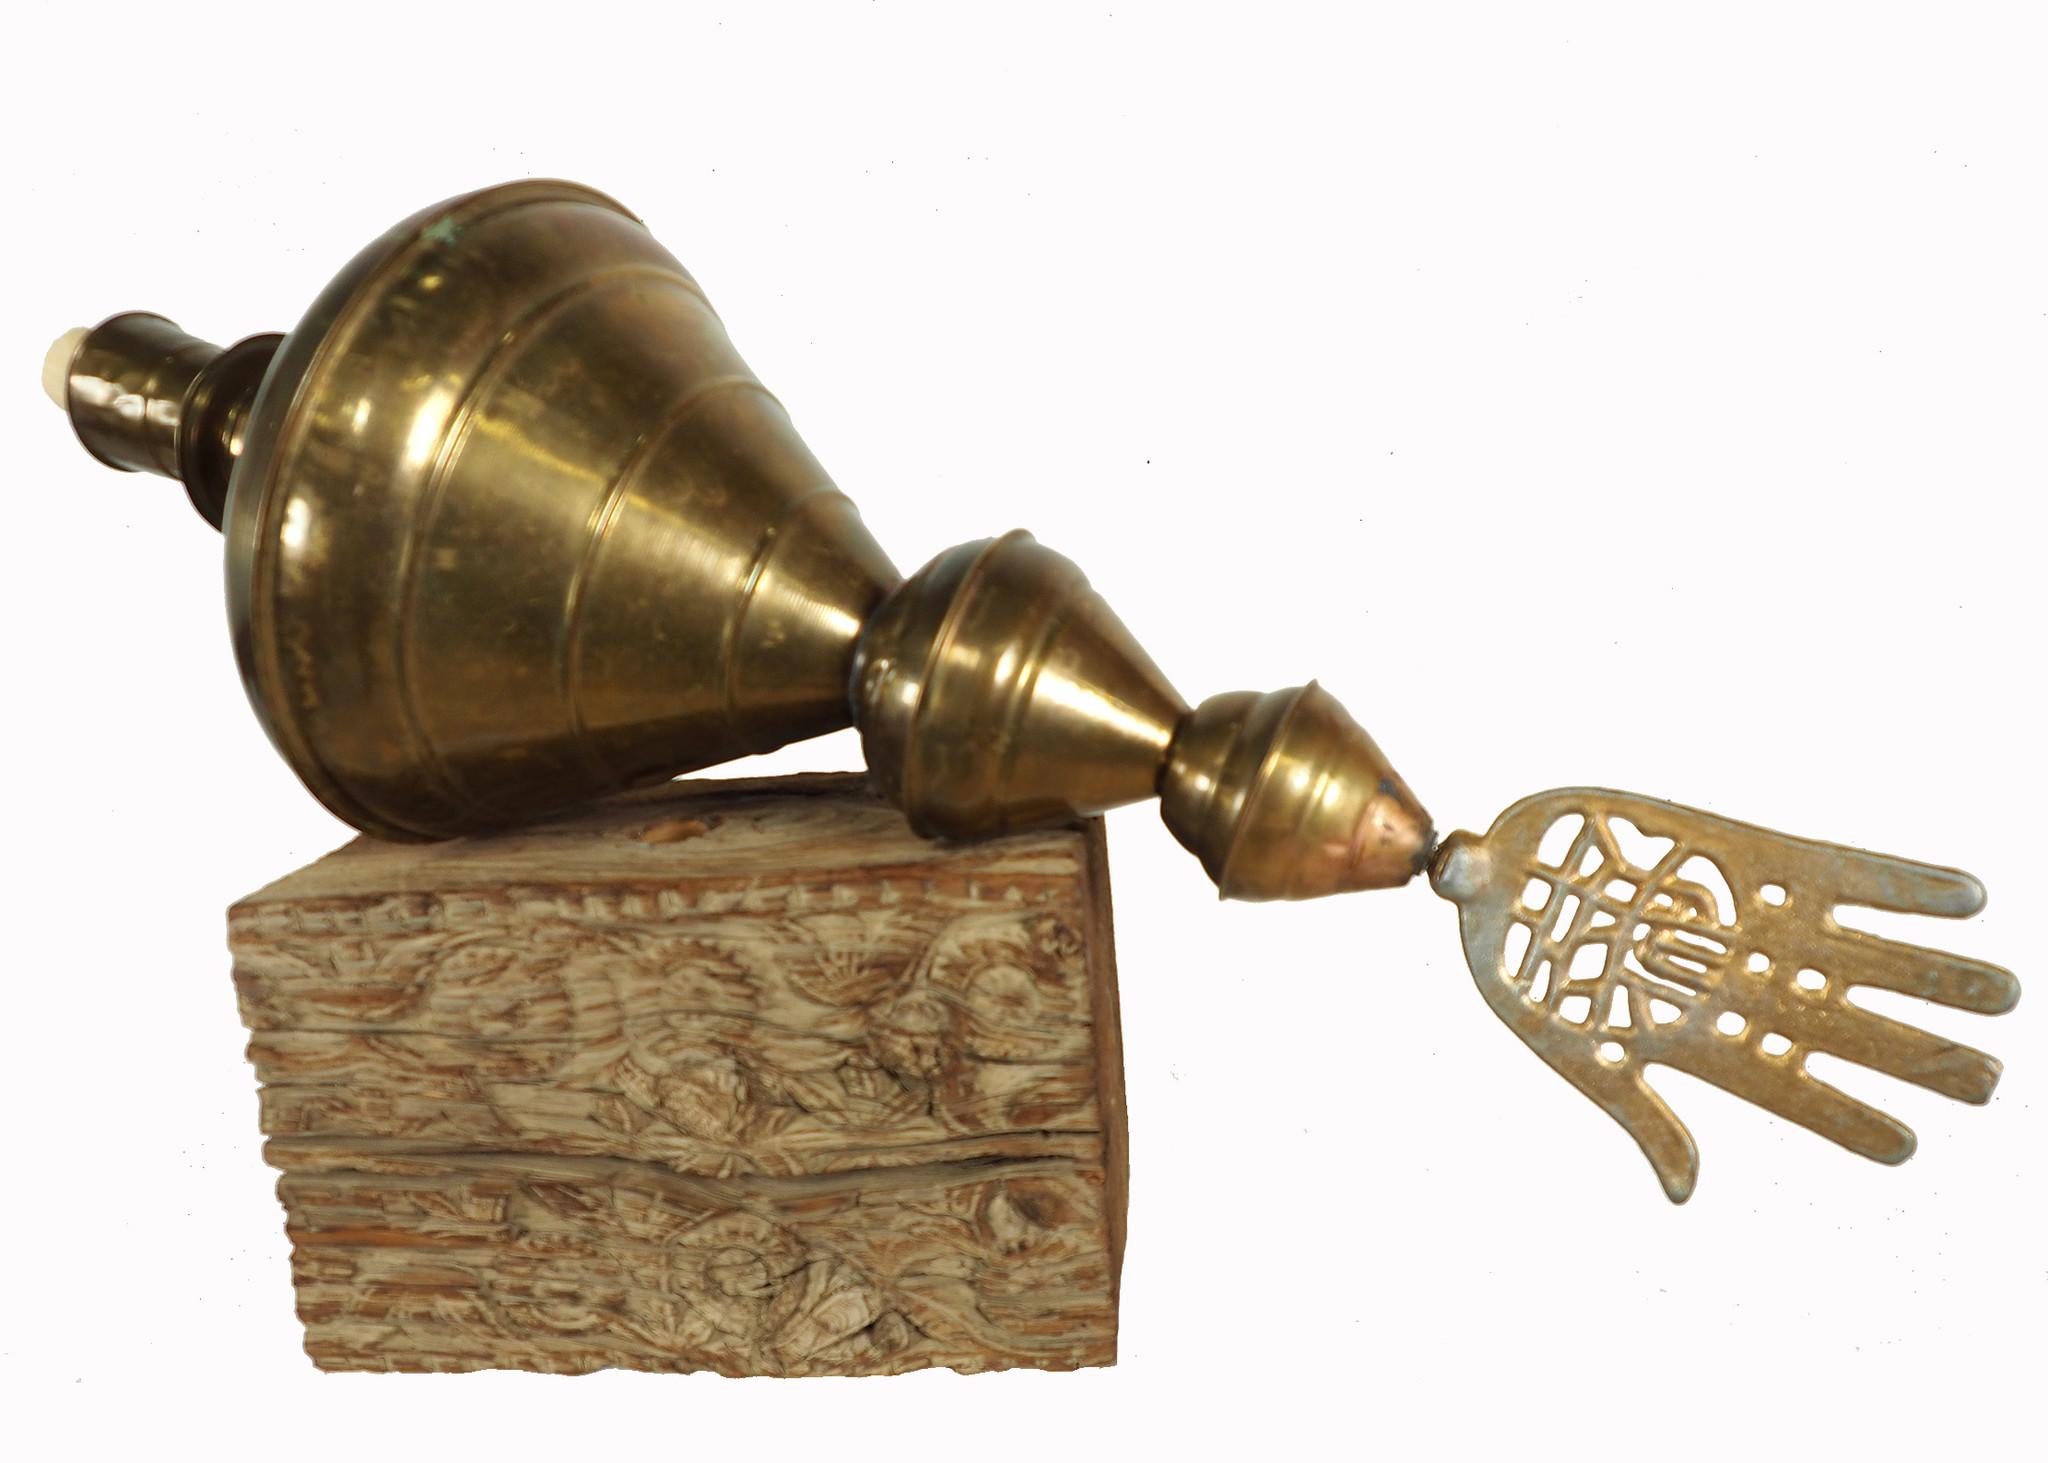 Antique Islamic brass mosque minaret lace Alam hand of fatima wood pedestal 19